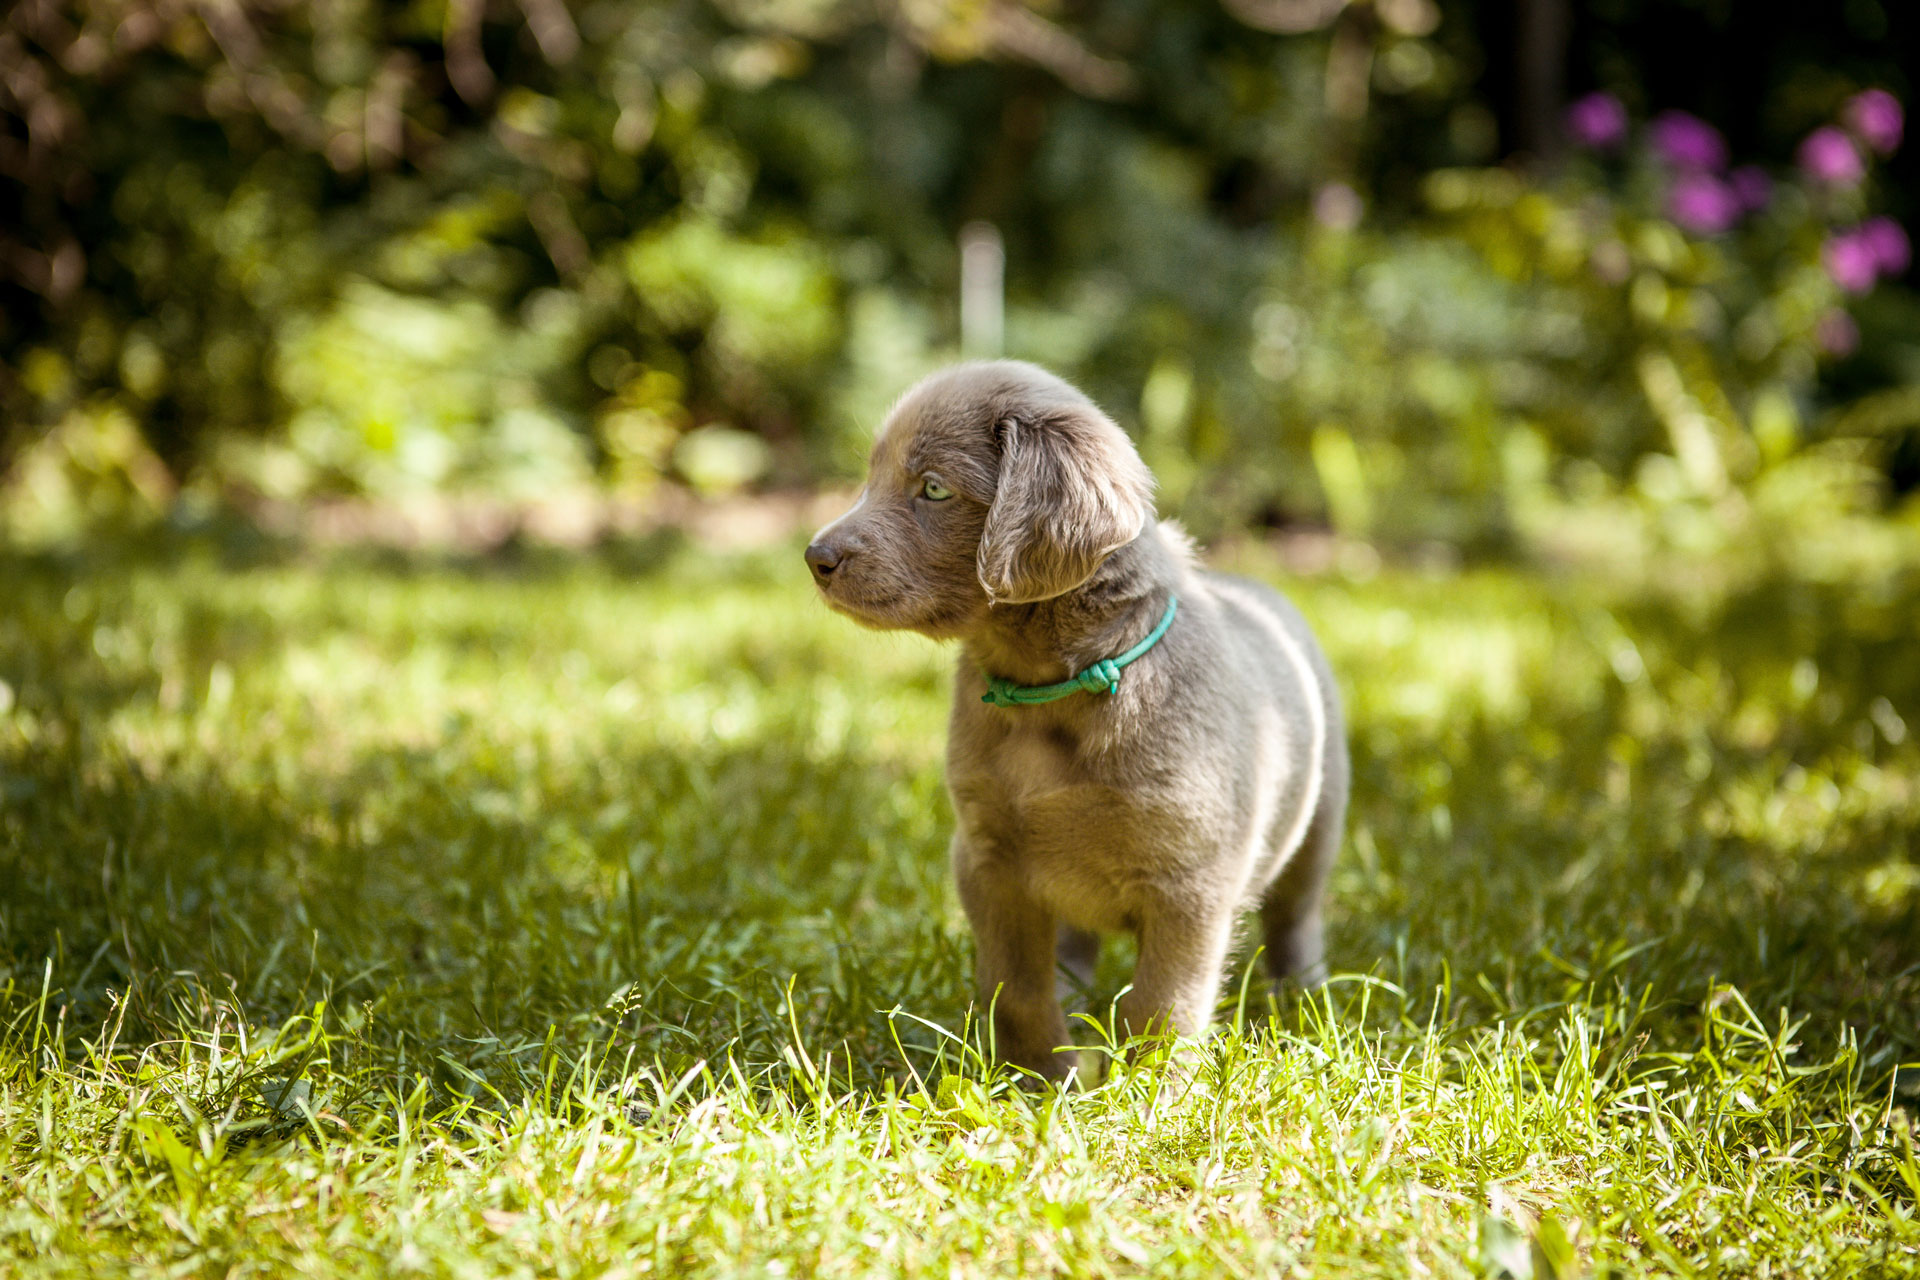 New Puppy Checklist: Essentials For Your New Puppy